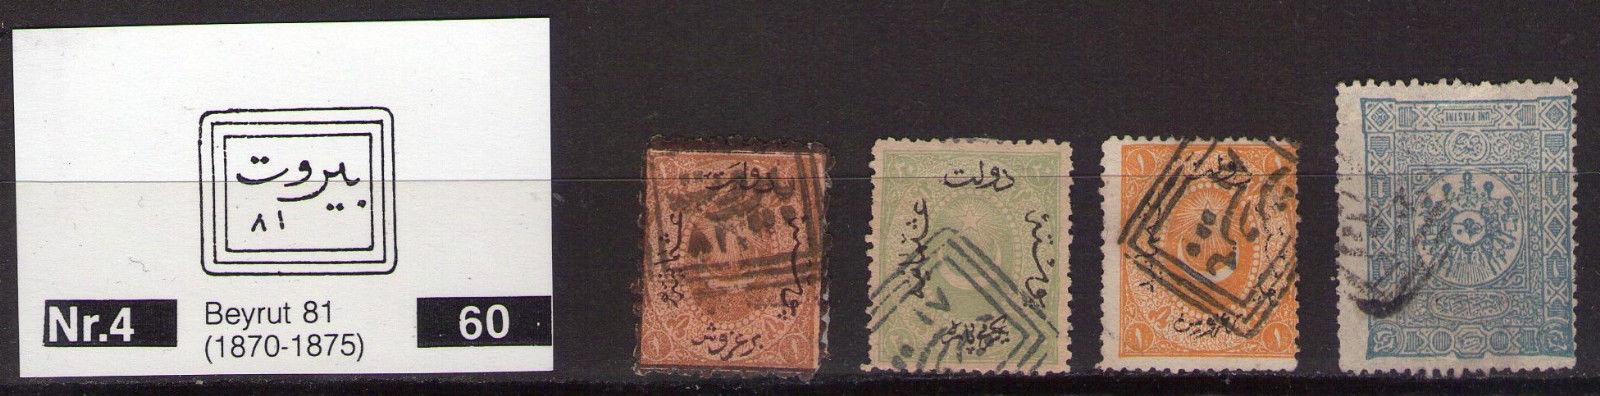 Beyrut 81 - 1870-1875